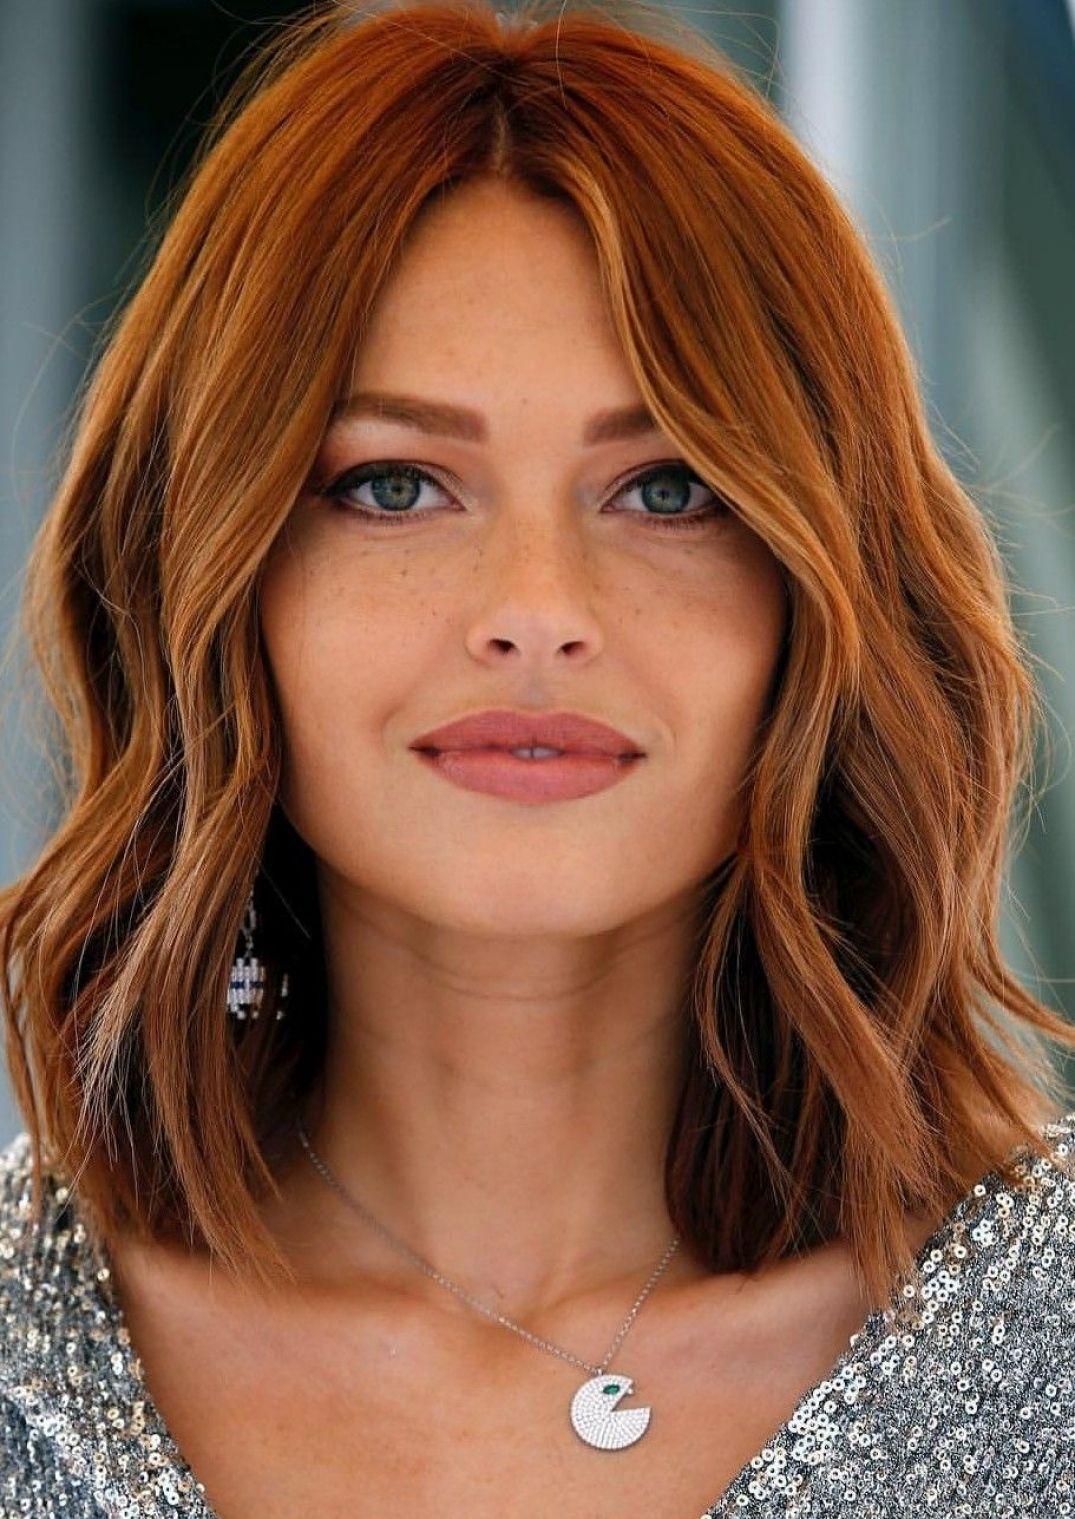 Rothaarige Lob Haarschnitt 09 01 2019 Mit Bildern Frisuren Dunkelrotes Haar Frisur Rote Haare